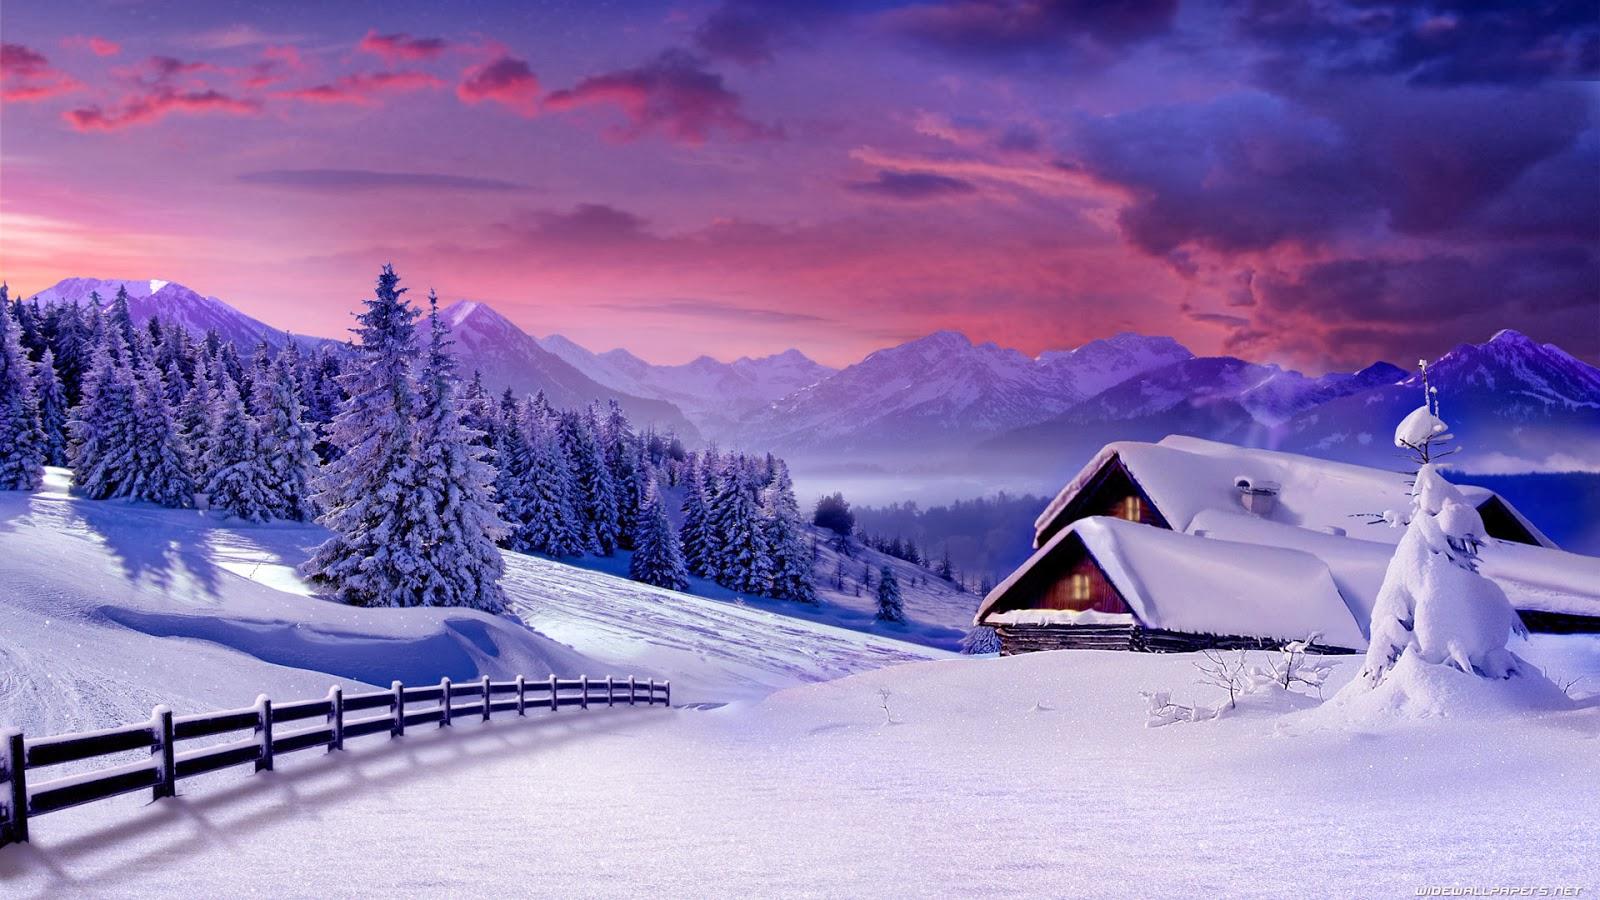 widescreen winter scene wallpaper wallpapersafari